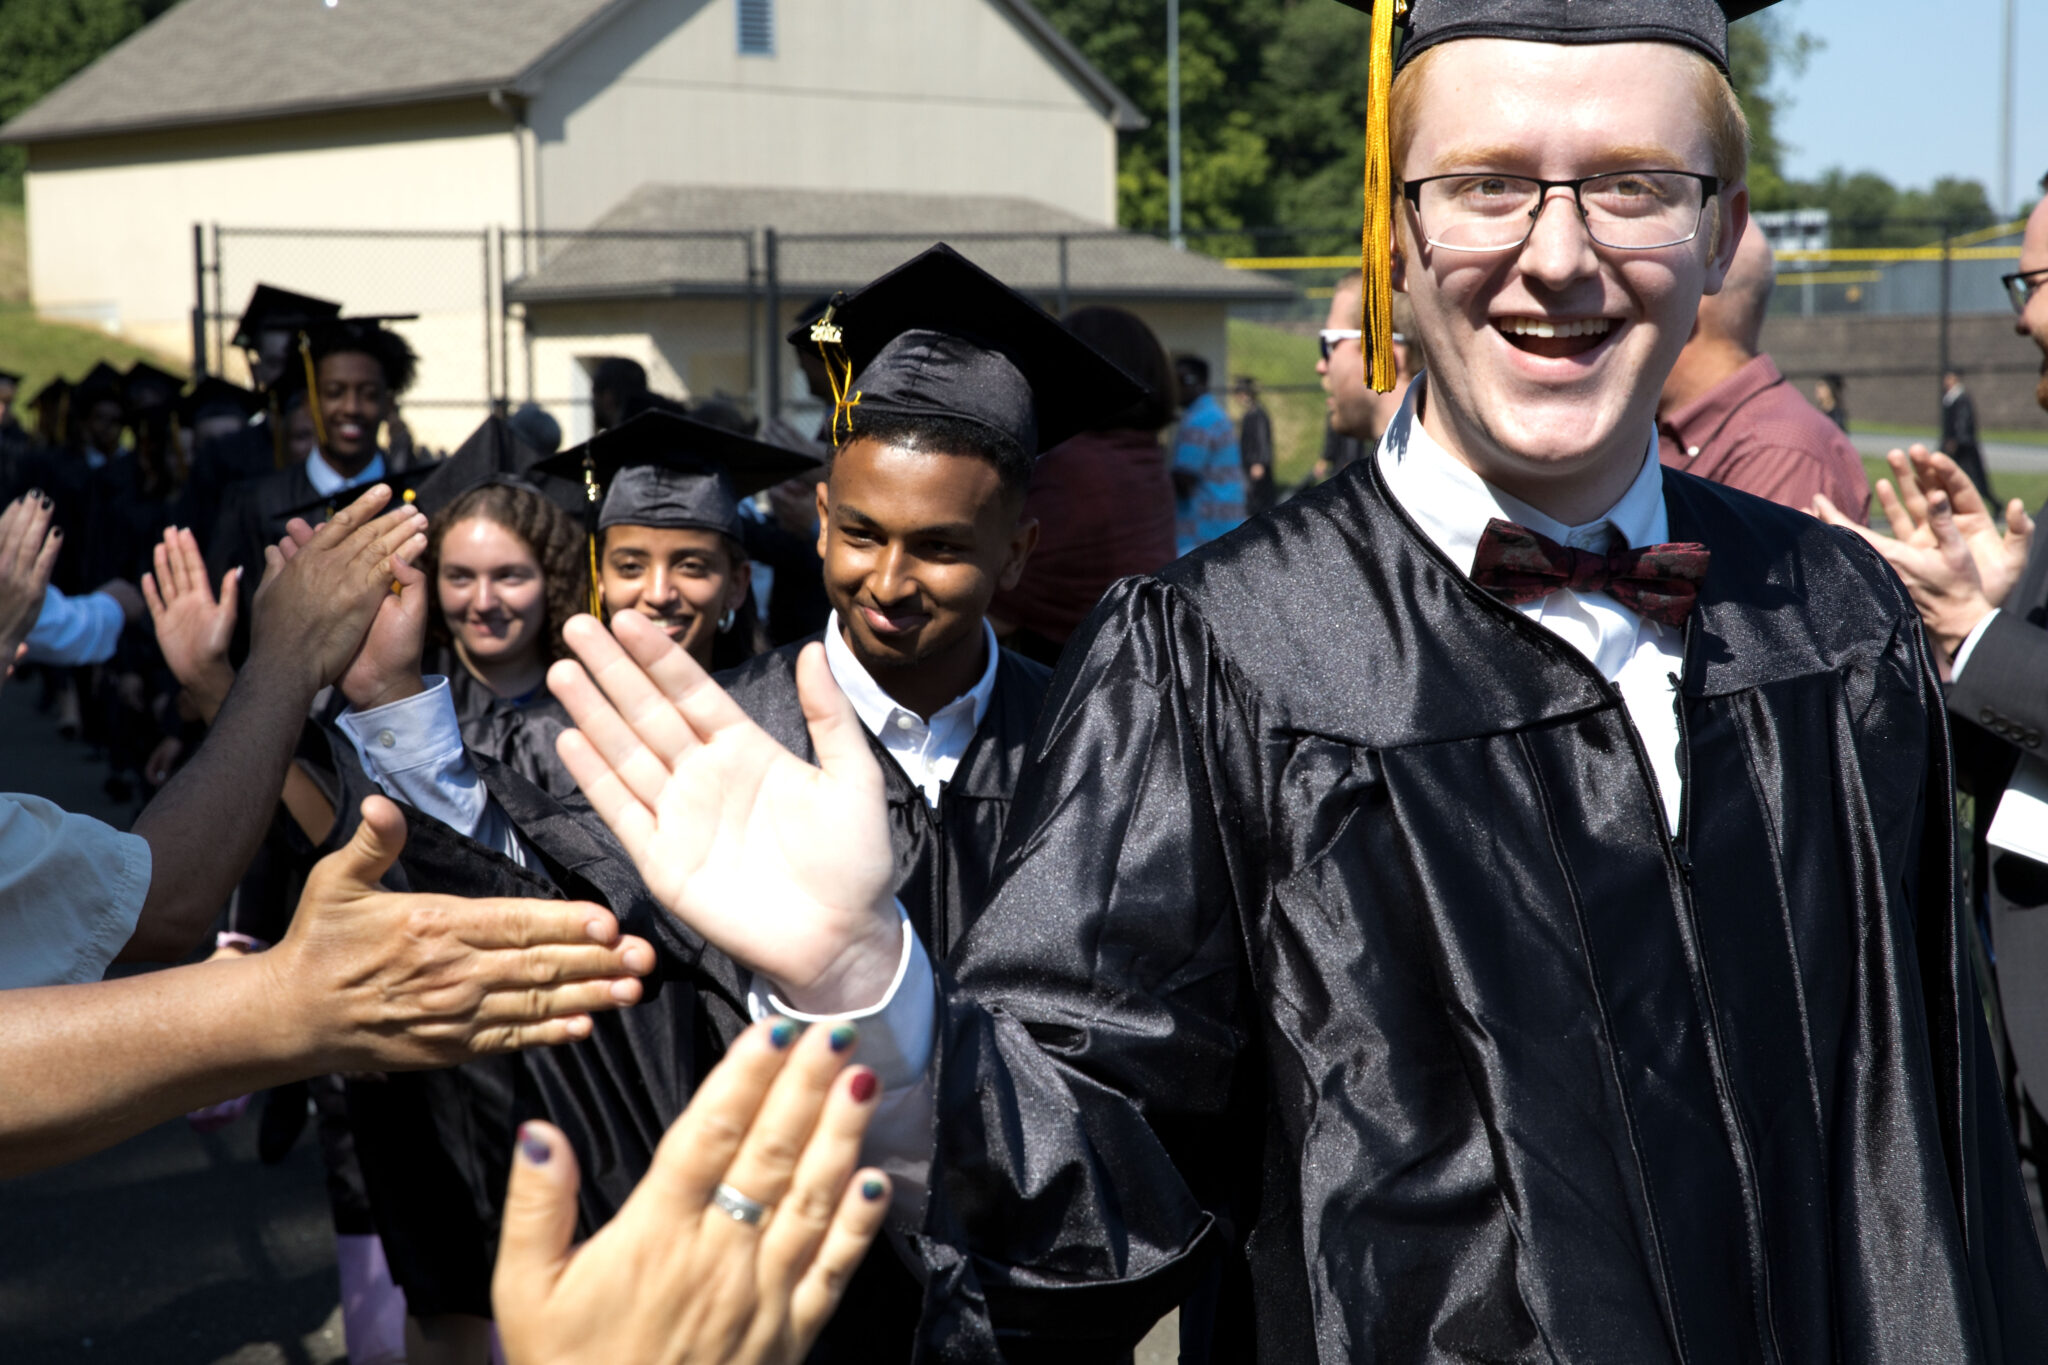 graduates walking into commencement high fiving teachers